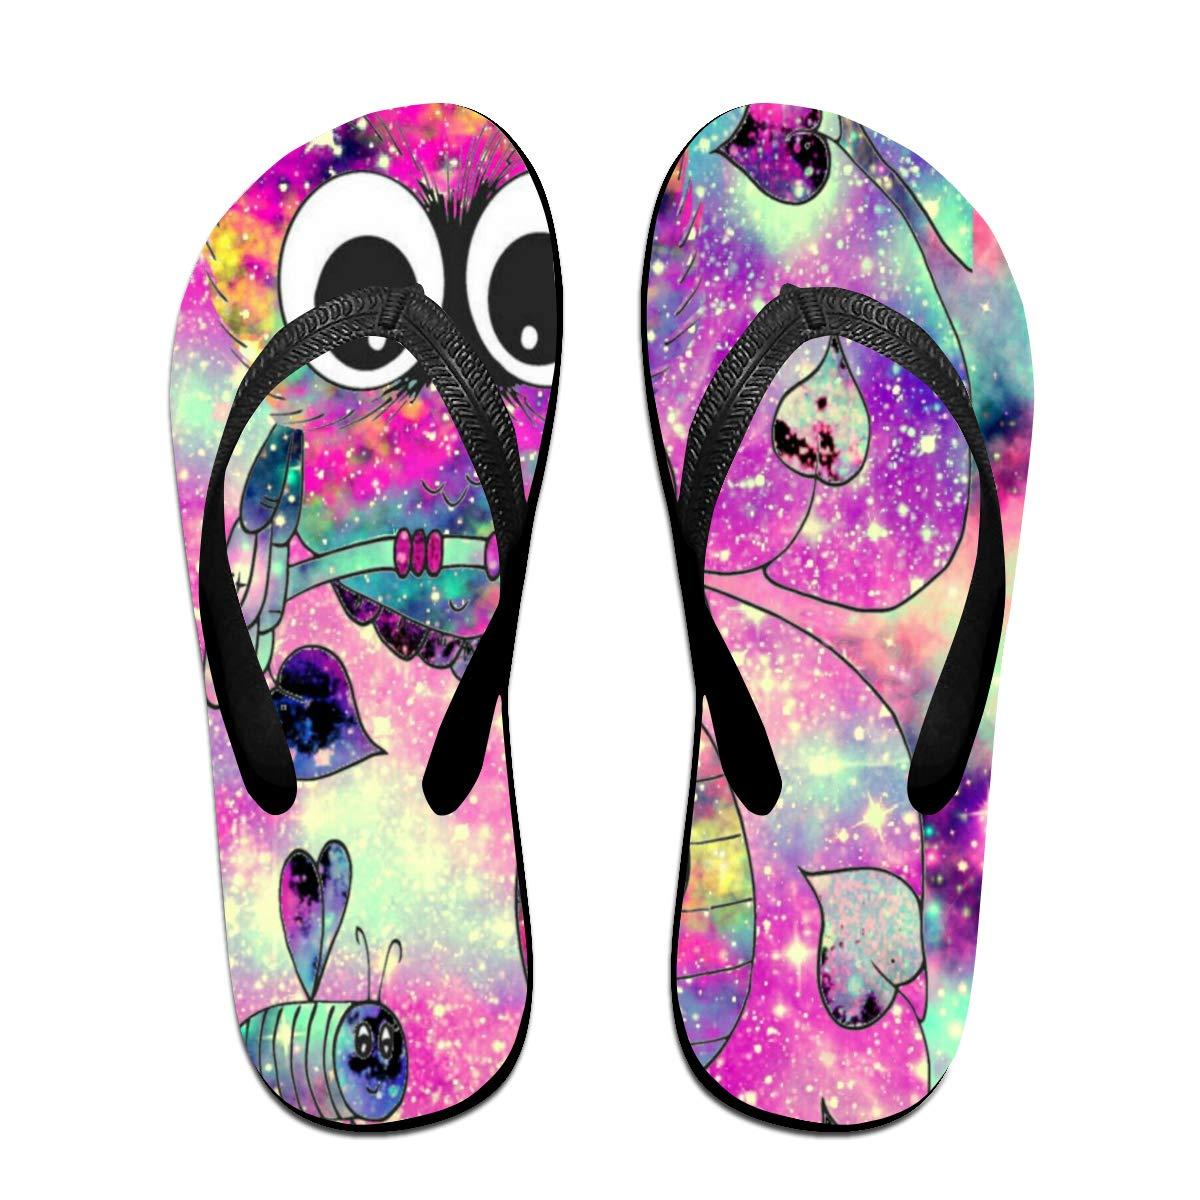 Unisex Summer Beach Slippers Owl Flip-Flop Flat Home Thong Sandal Shoes